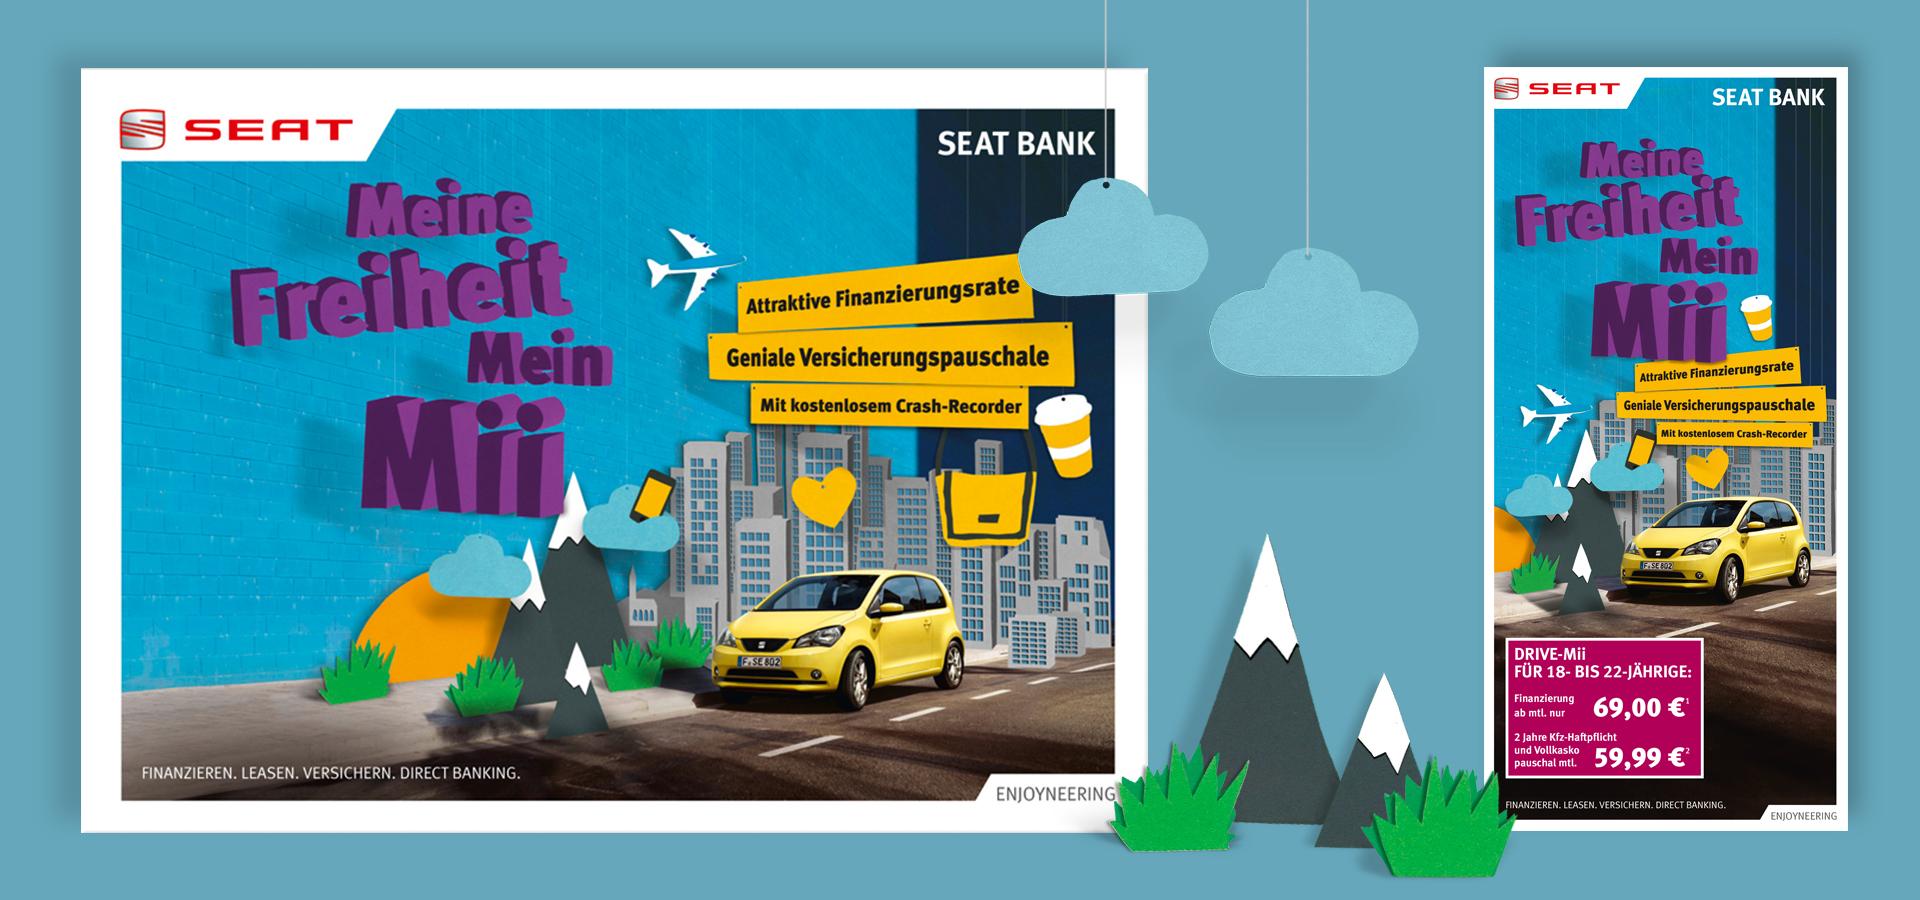 VWFS Mii Kampagne ©gobasil ~ Agentur für Kommunikation, Hamburg Hannover